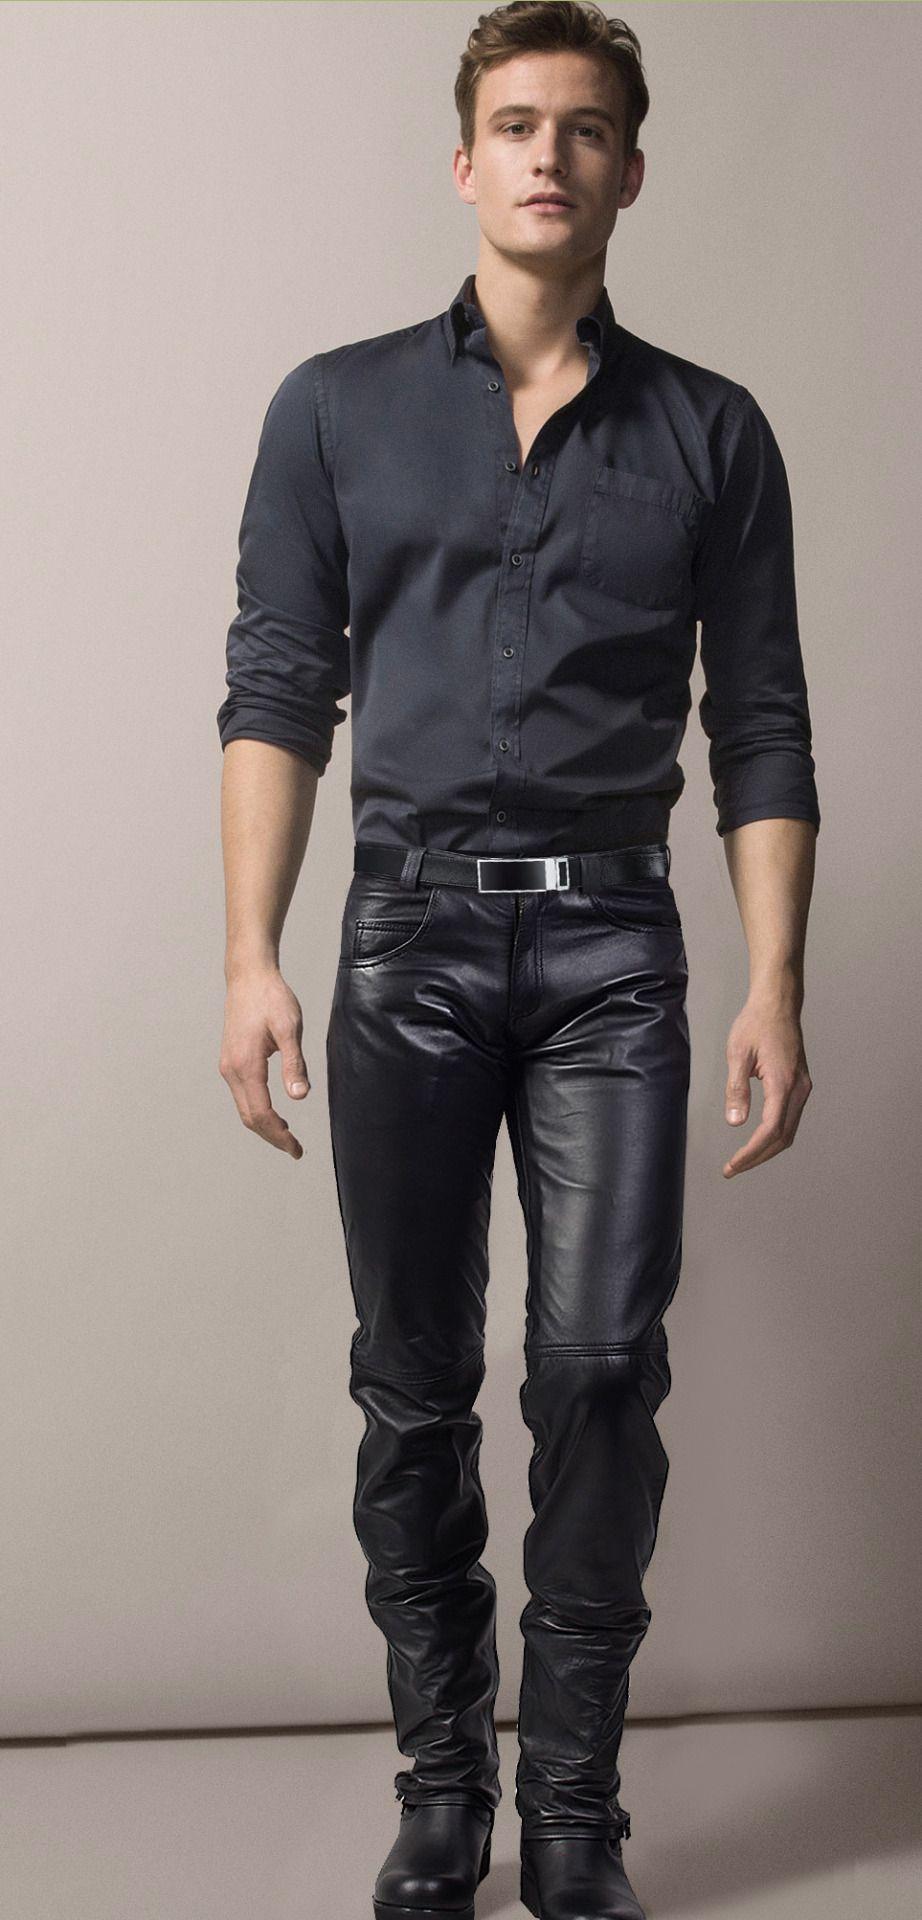 On Leather (mit Bildern) | Lederhose herren, Schwarze